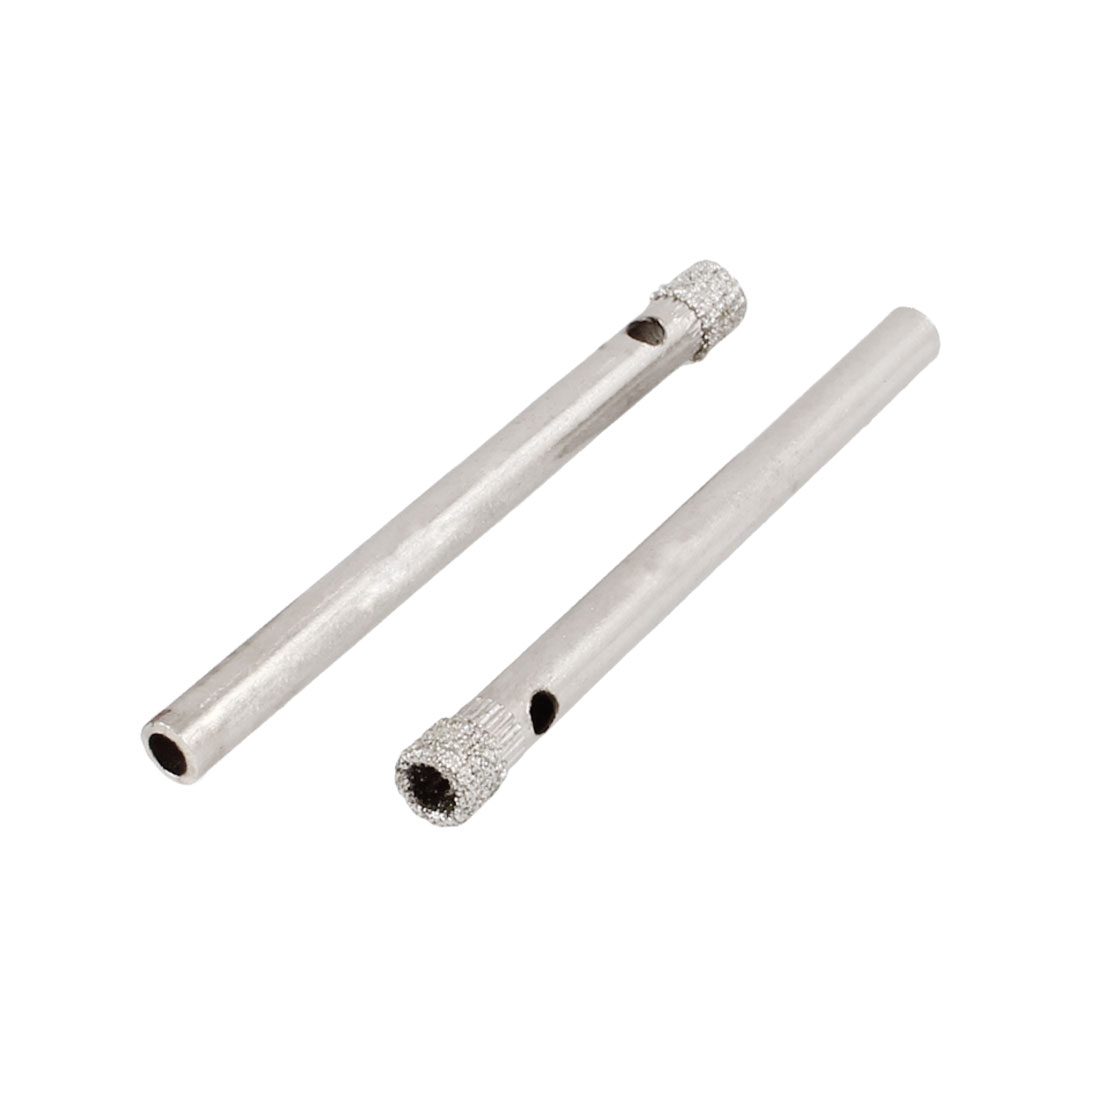 "Diamond Tool Drill Bit Tile Glass Hole Saw 4mm 5/32"" 2 Pcs"